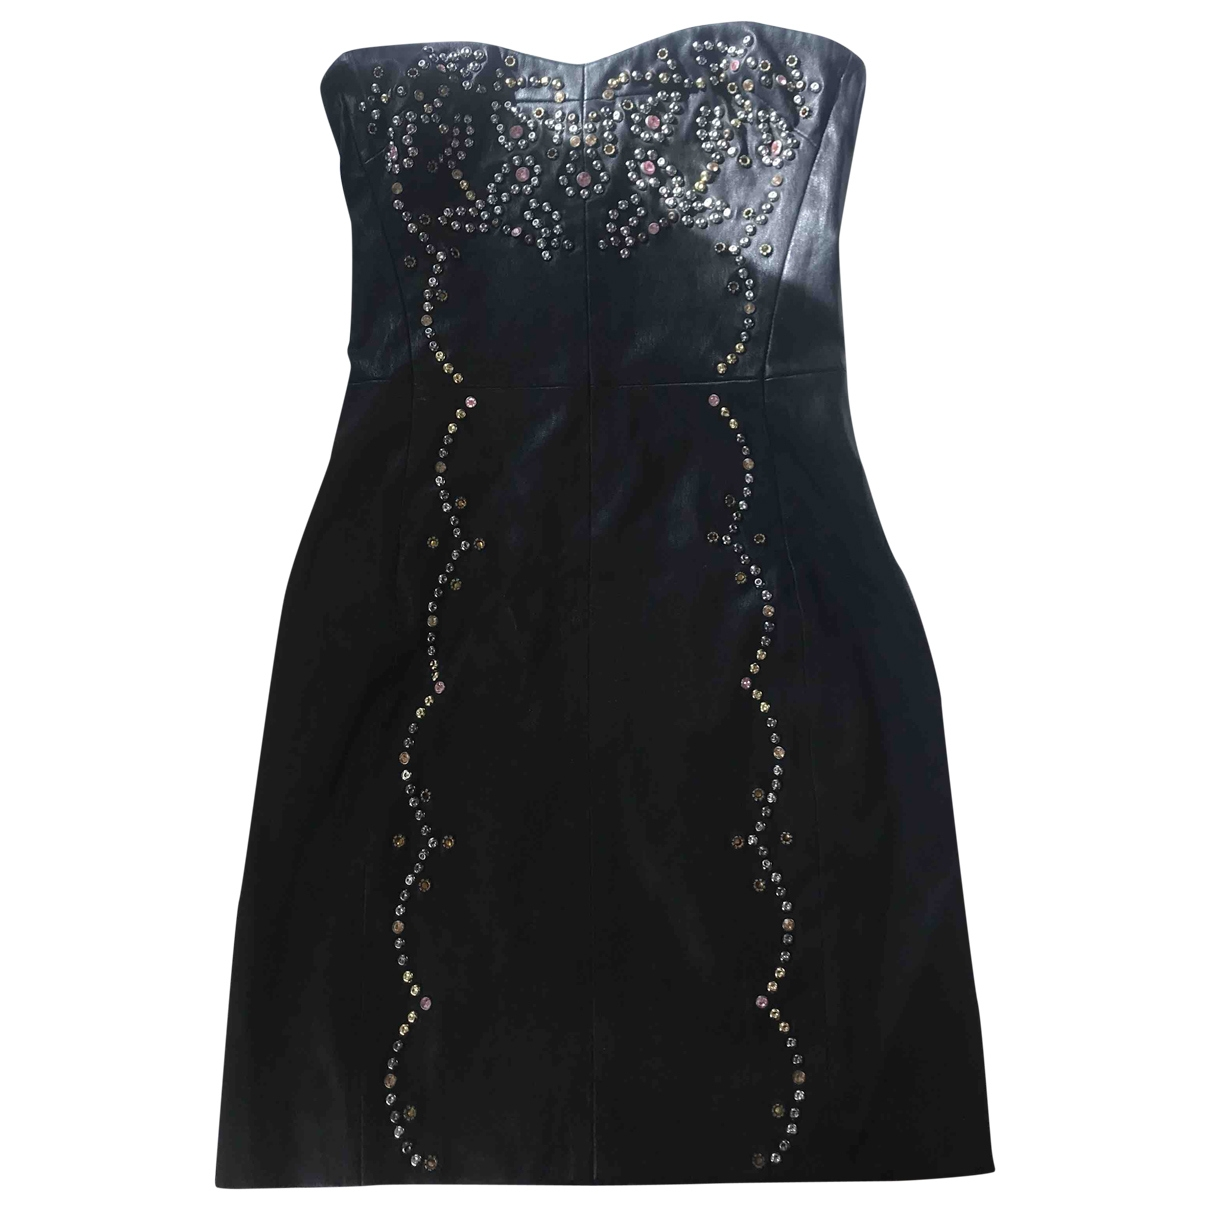 Isabel Marant \N Black Leather dress for Women 34 FR